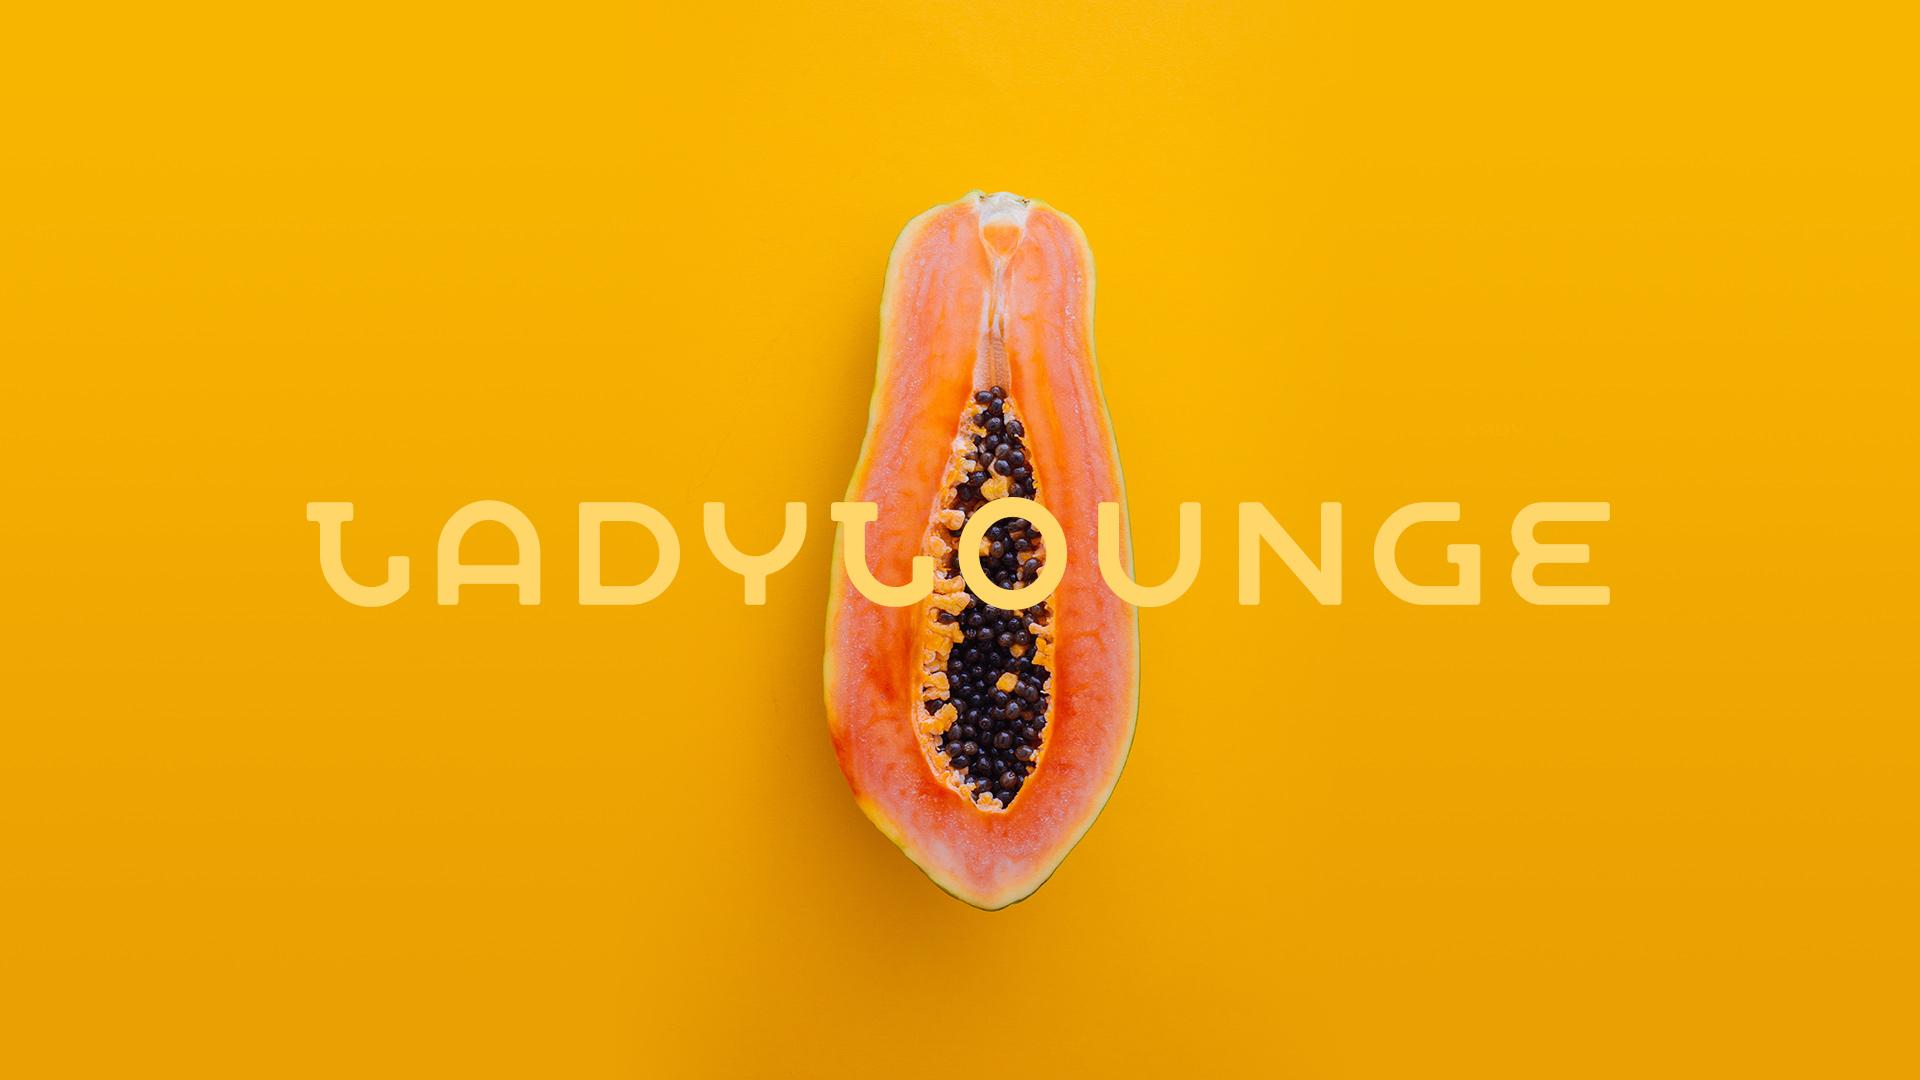 ladylounge.jpg